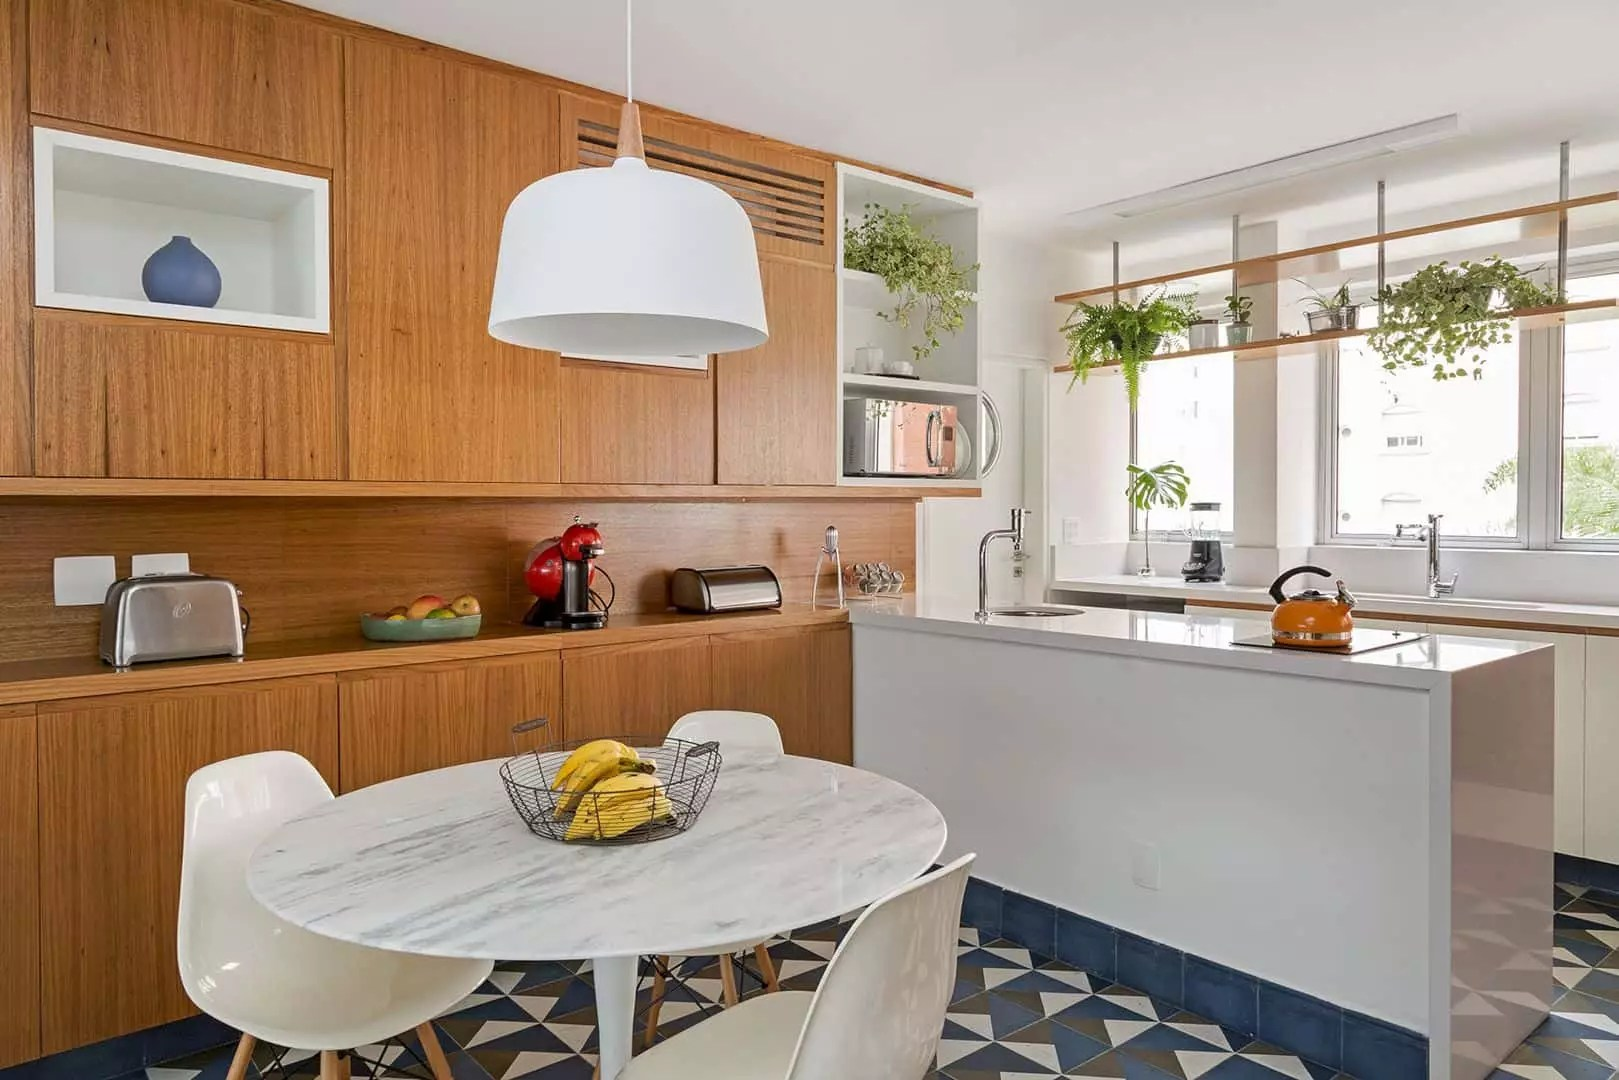 Apartamento Itaim: Minimalist Apartment with Wood Elements and Bright Atmosphere